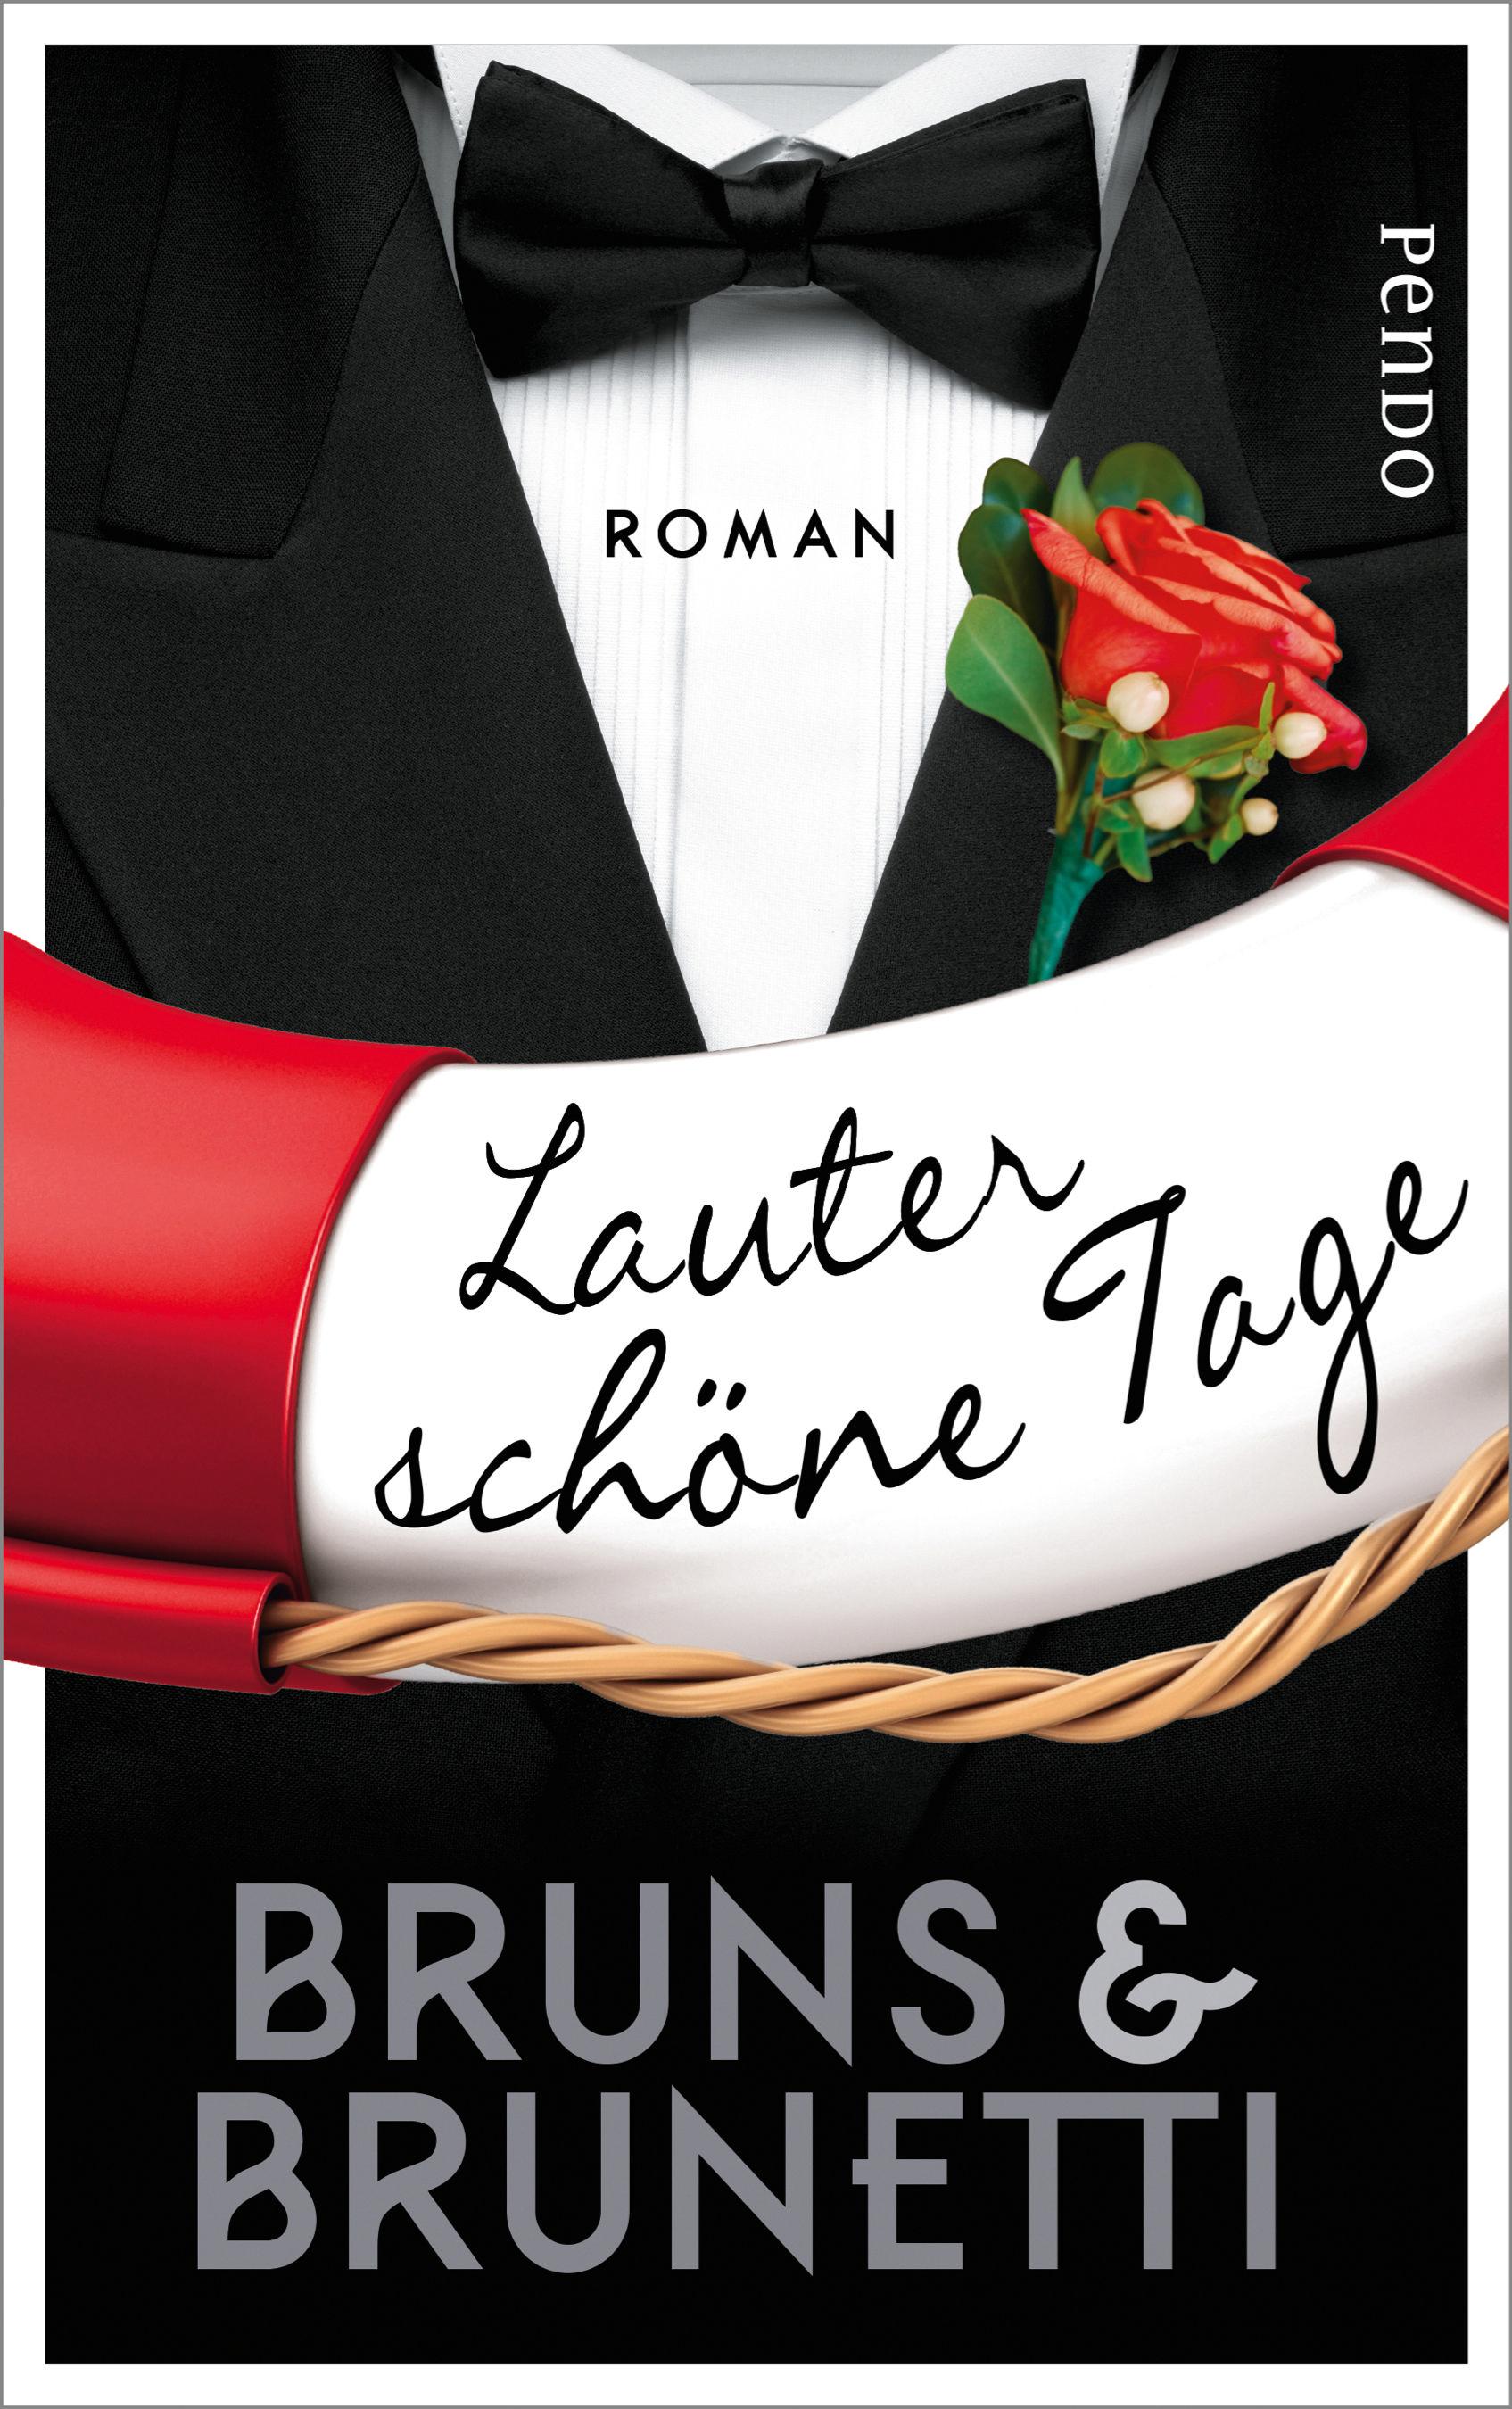 Lauter-schoene-Tage-Bruns-amp-Brunetti